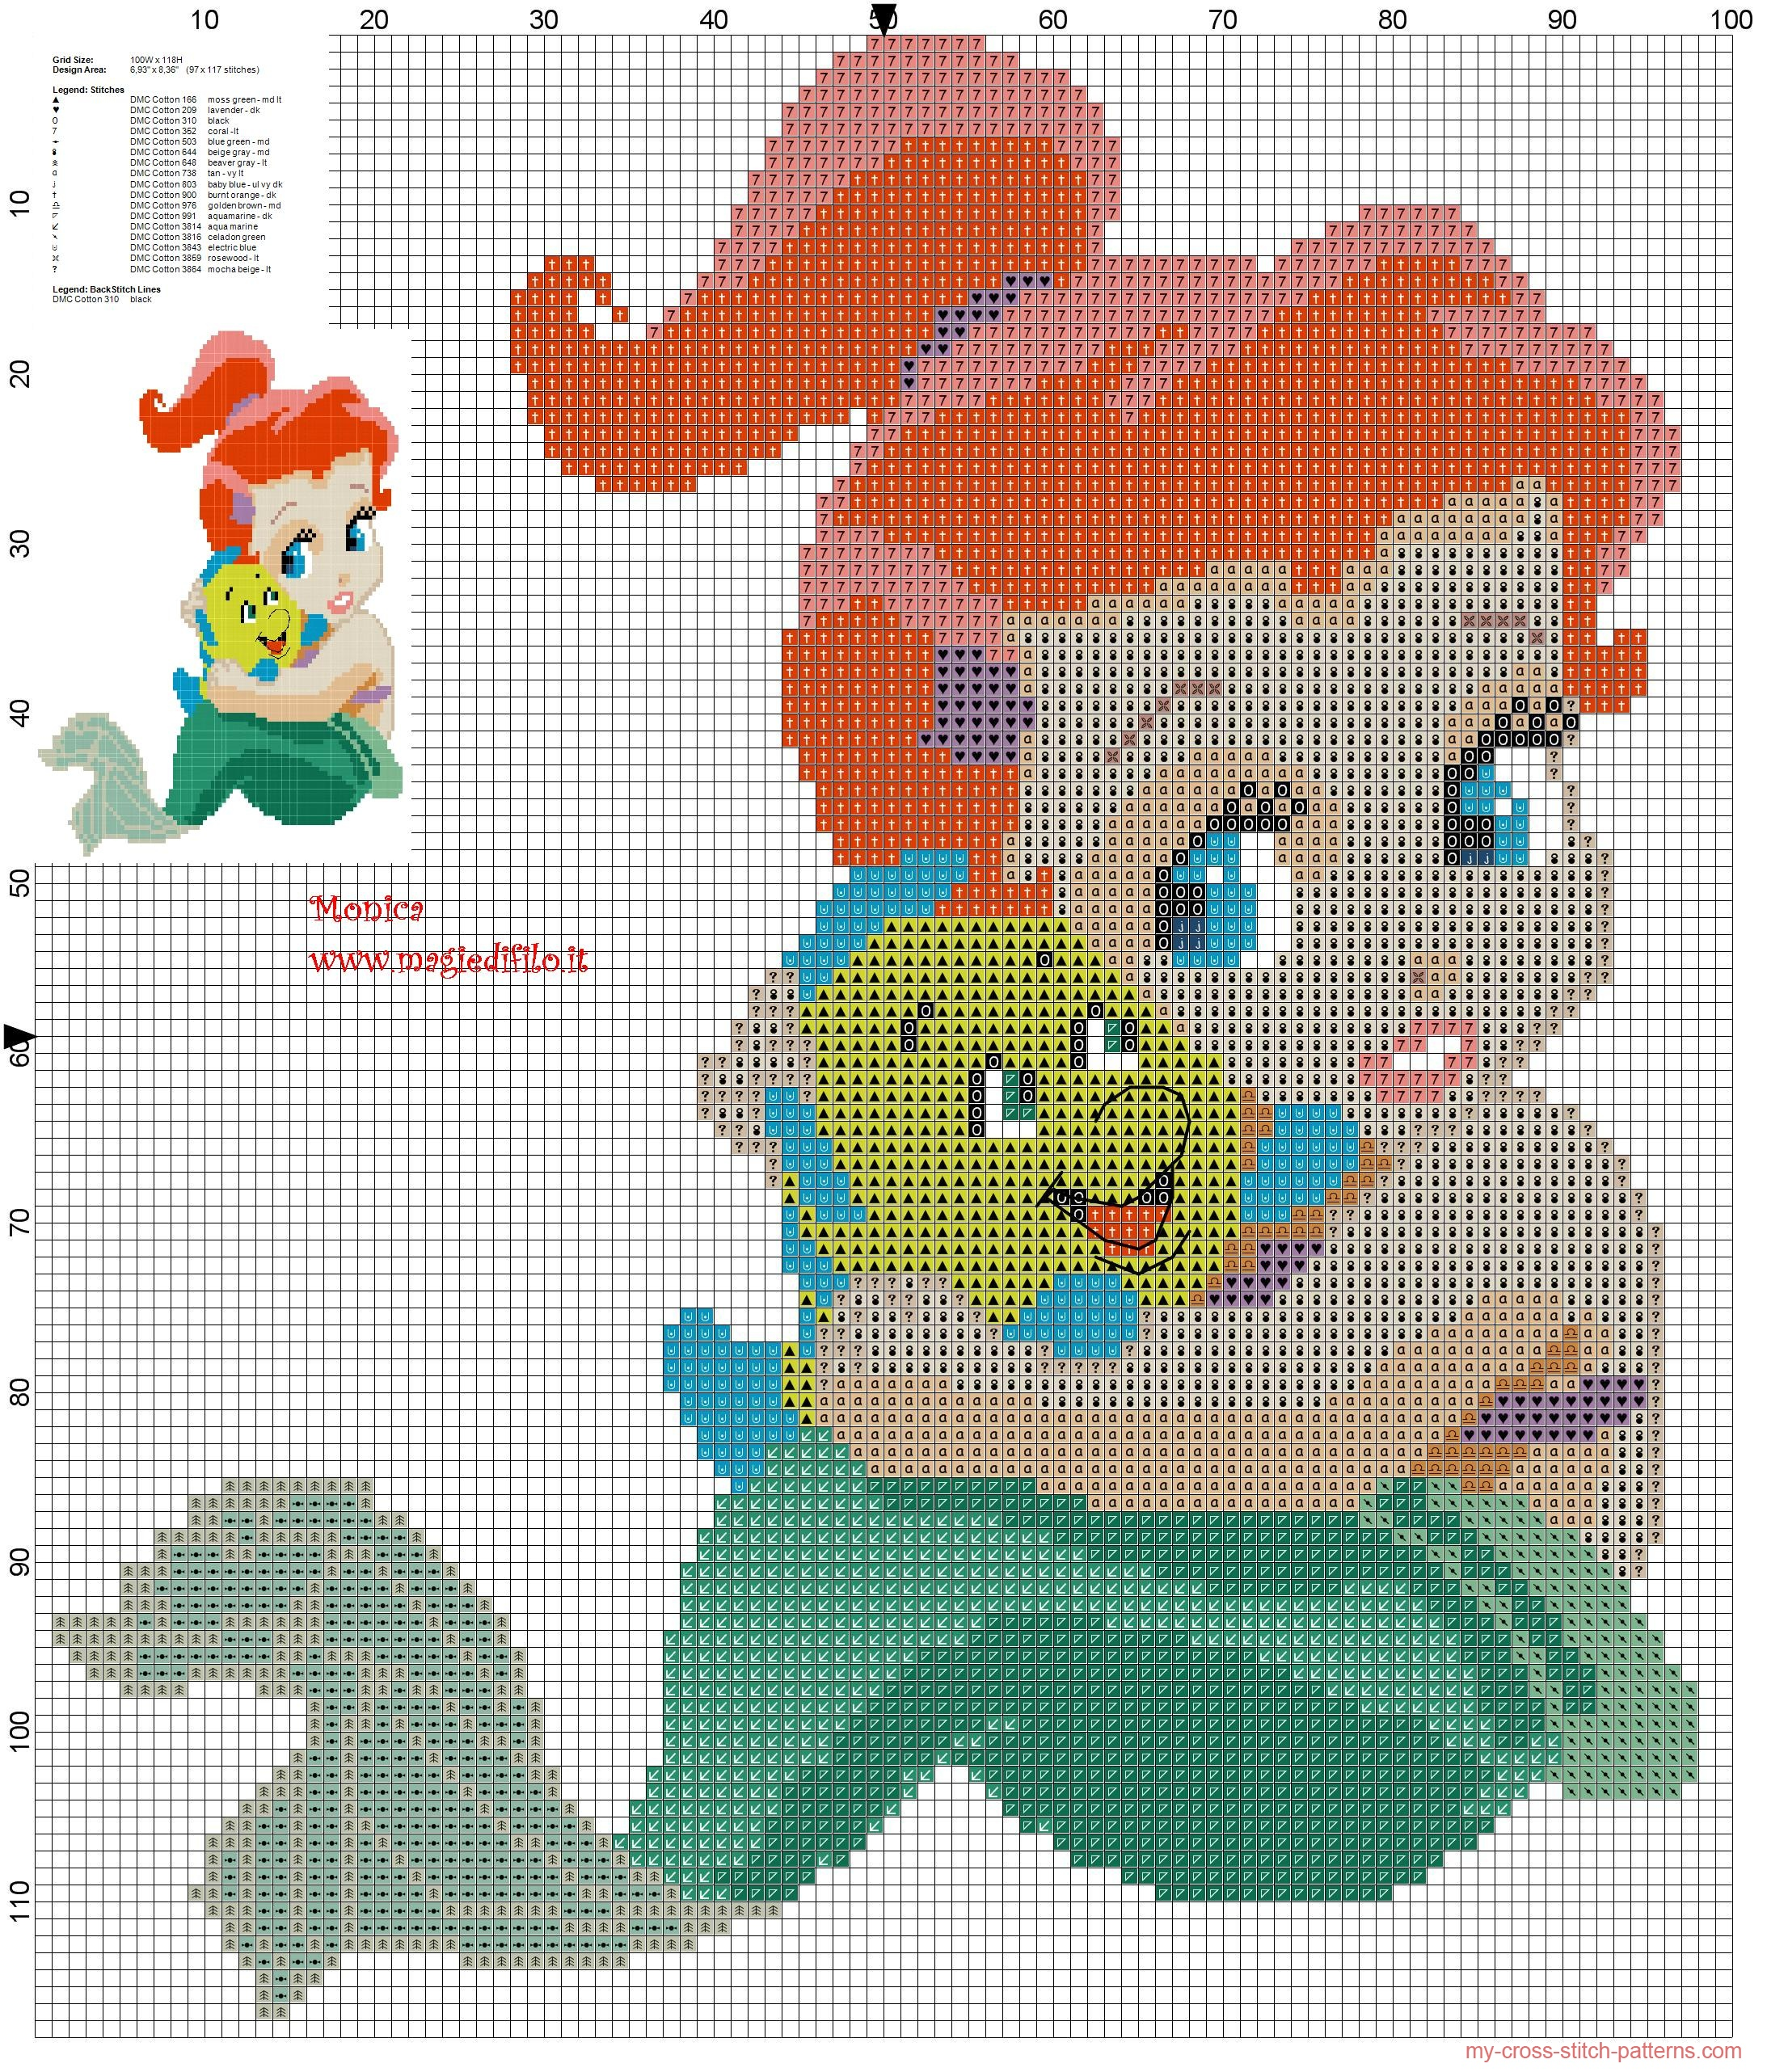 baby_ariel_with_flanders_cross_stitch_pattern